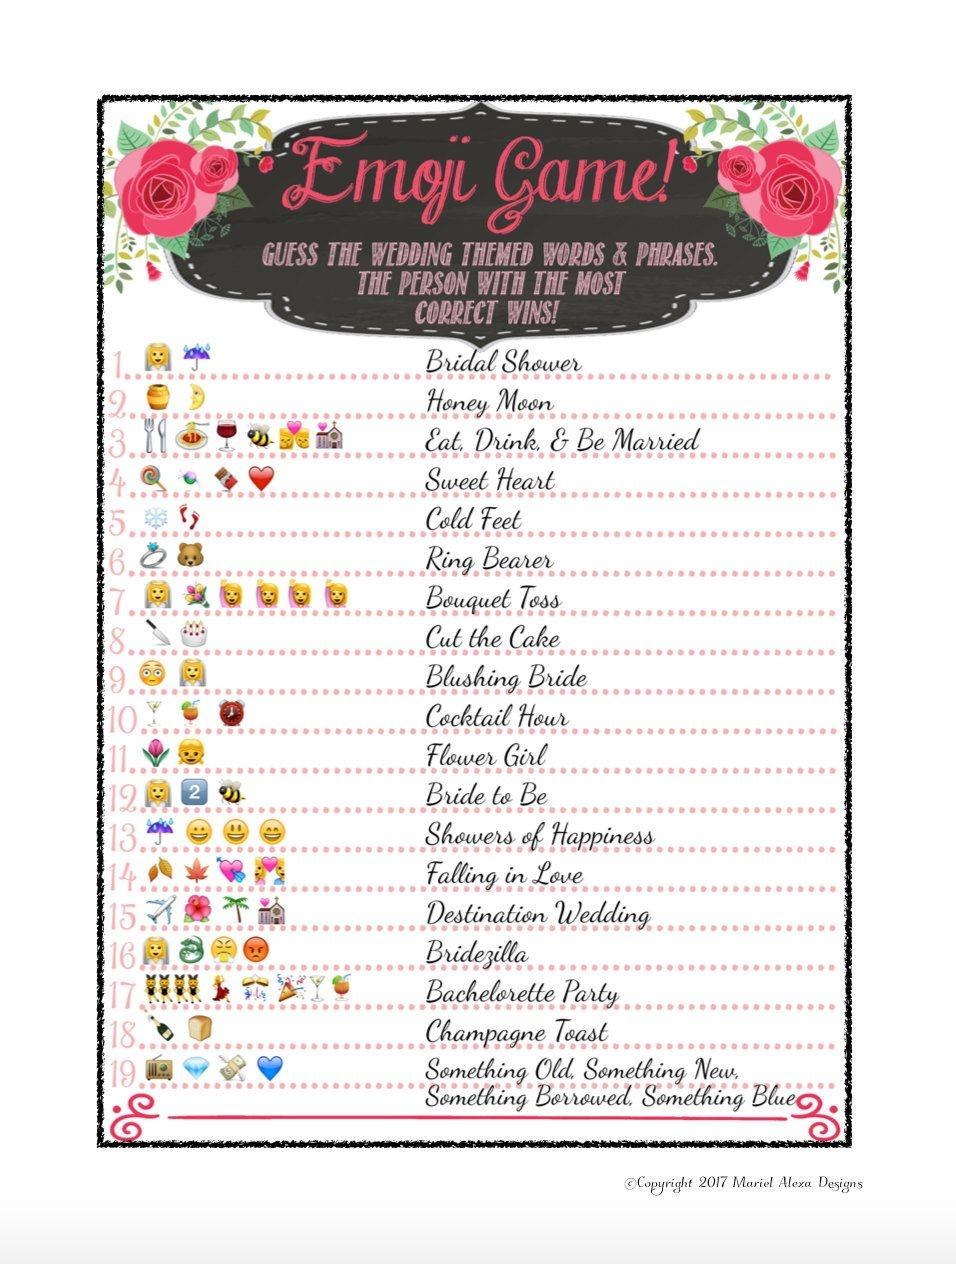 8 Free Printable Bridal Shower Games - Download Some Fun Today! | My - Wedding Emoji Pictionary Free Printable